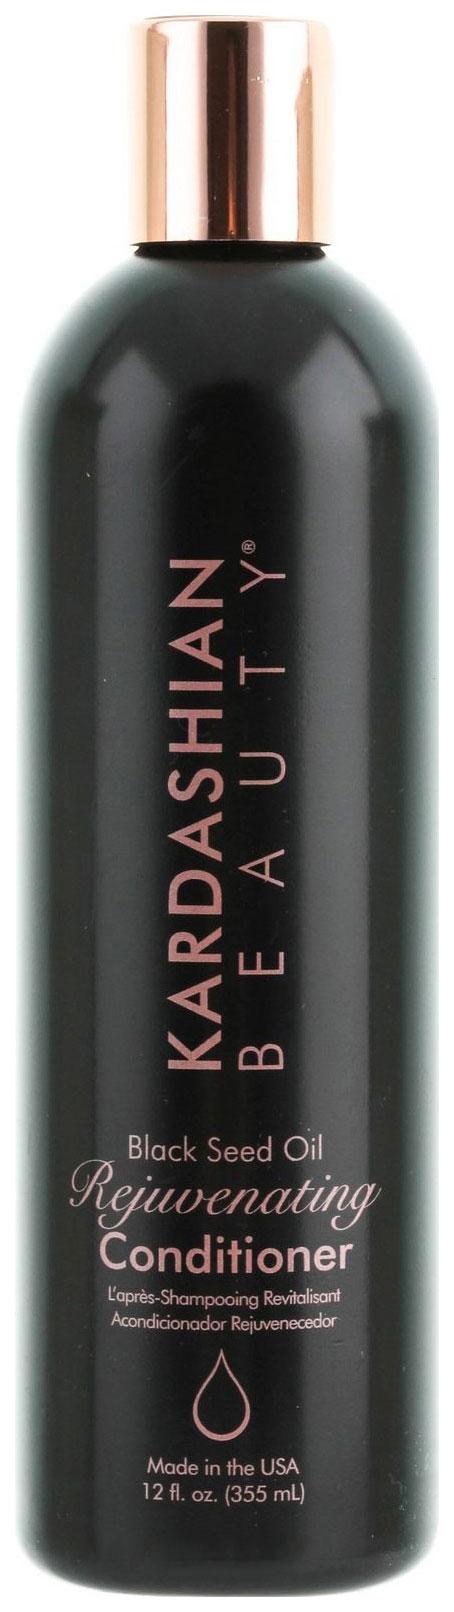 Кондиционер для волос CHI Kardashian Beauty Black Seed Oil Rejuvenating 355 мл